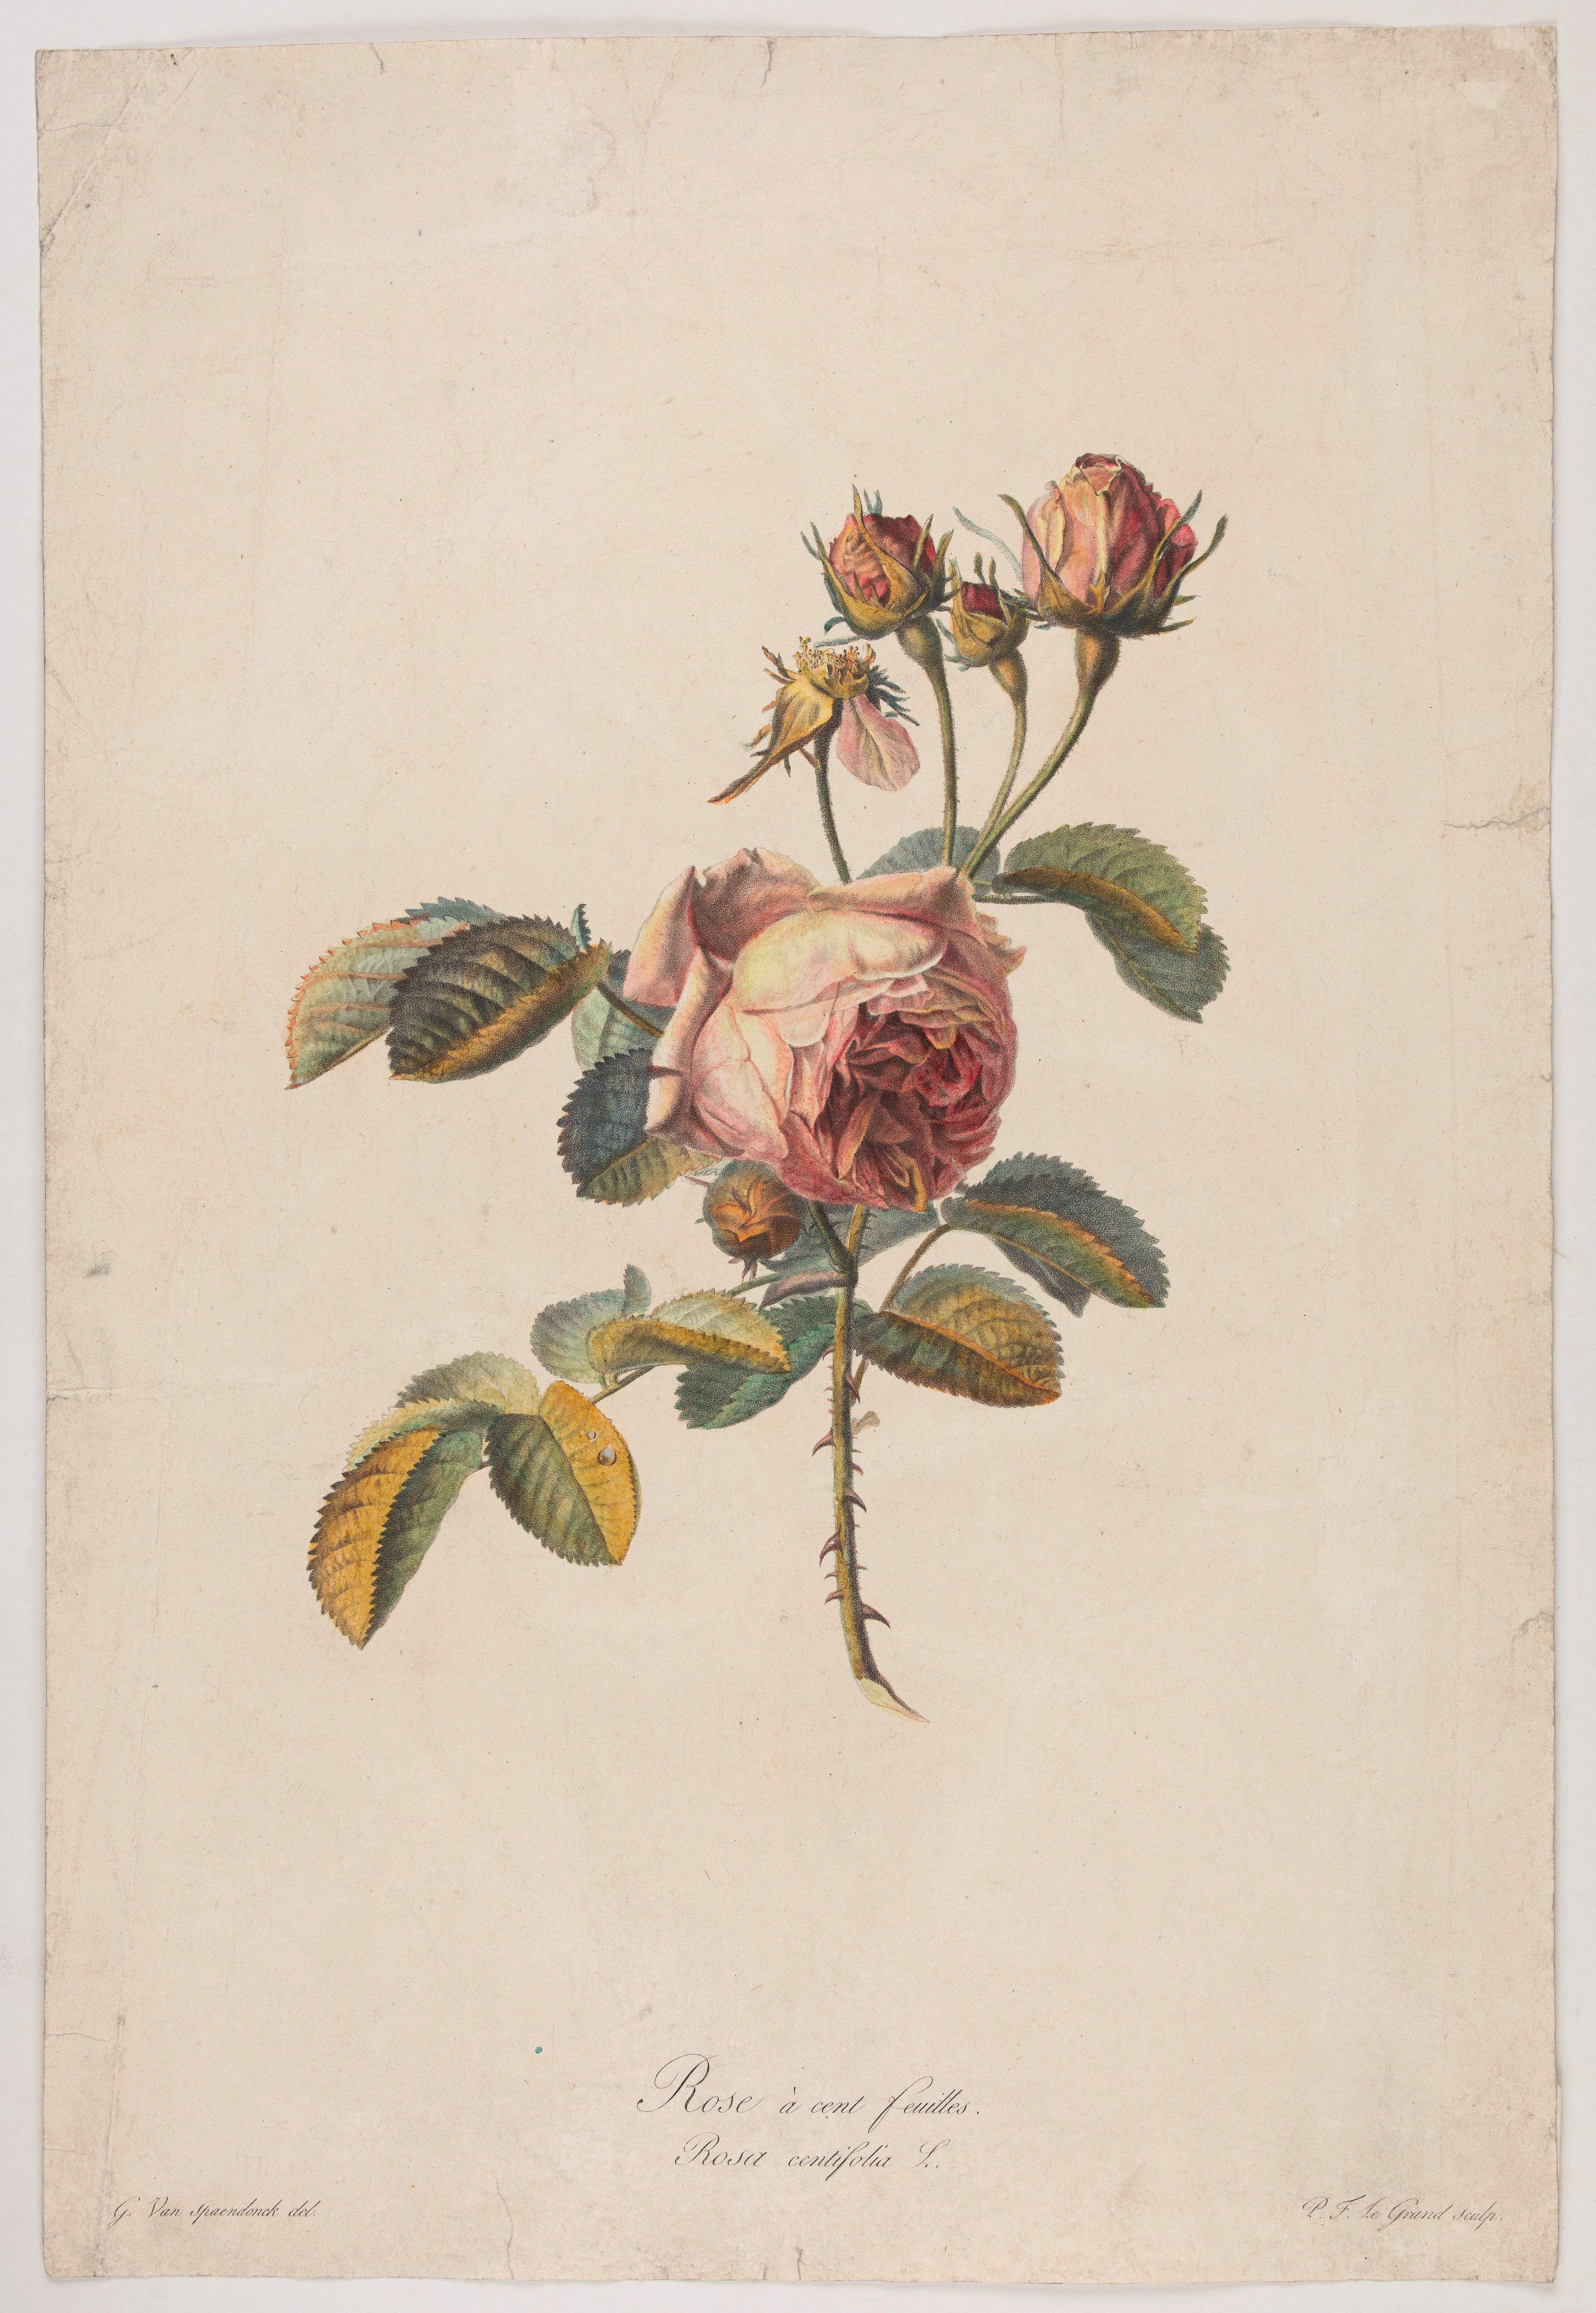 SPAENDONCK, Van. G. -  Rose à cent feuilles - Rosa contifolia L.